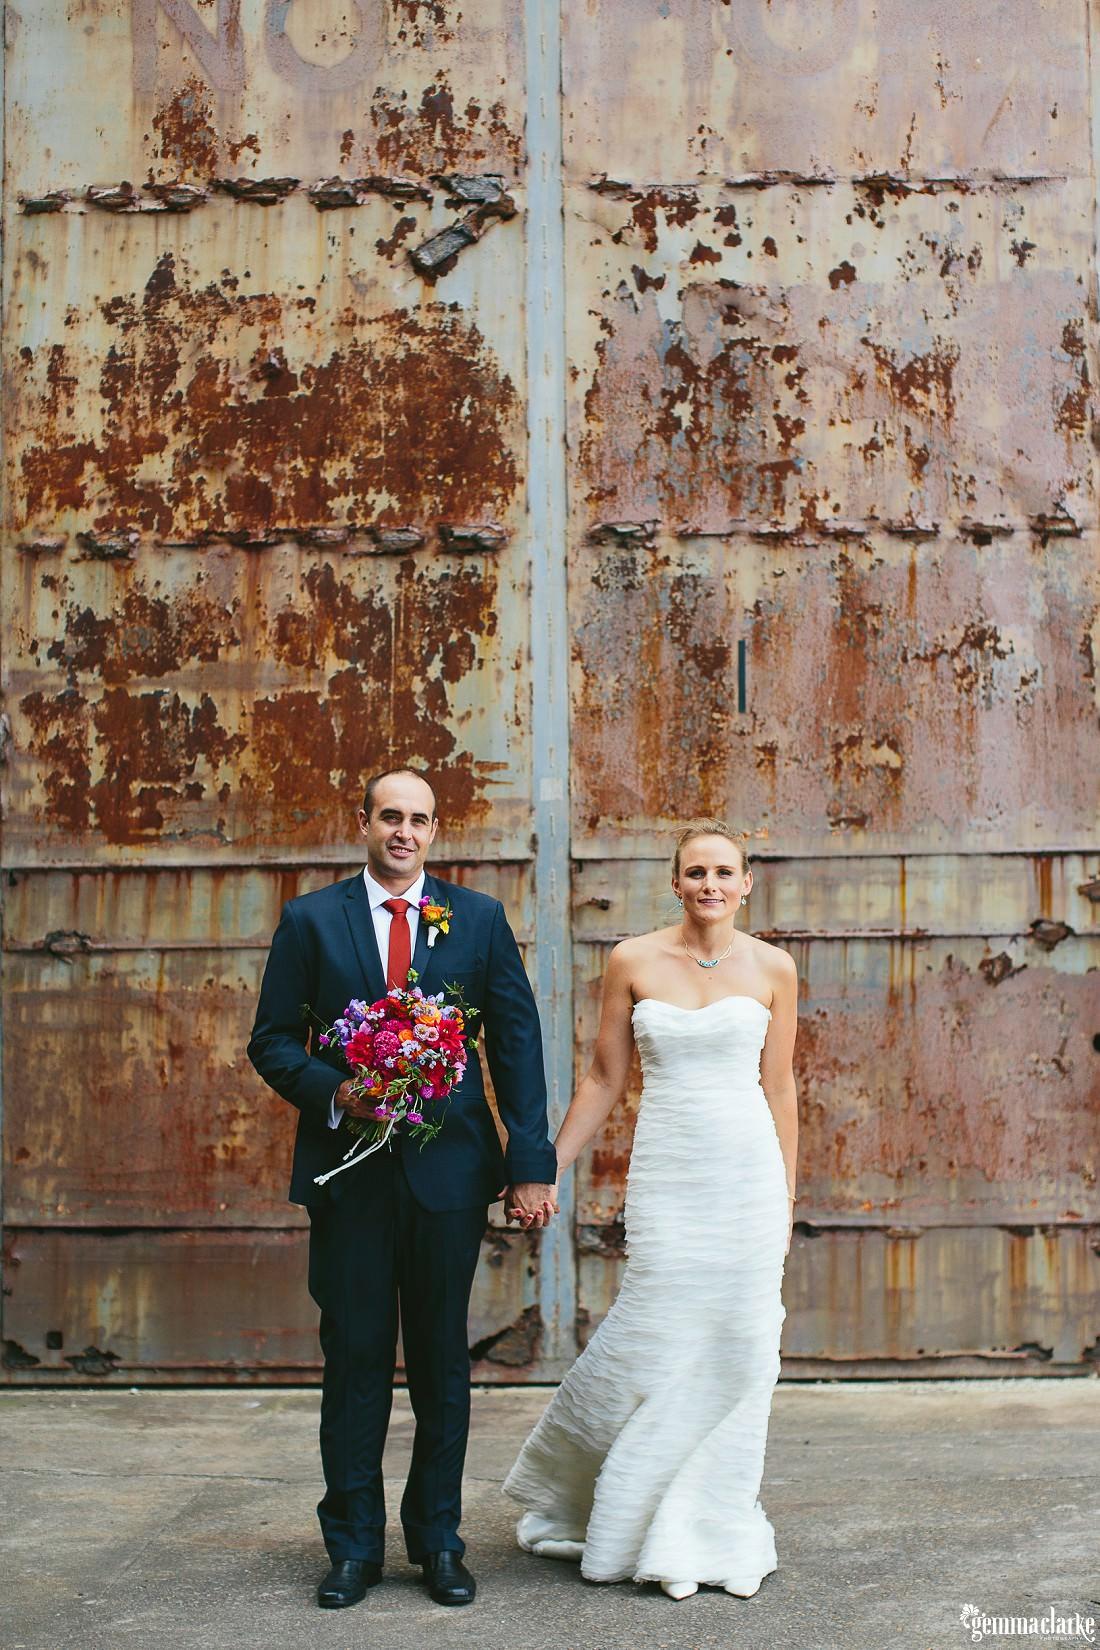 gemmaclarkephotography_cockatoo-island-wedding-photos_the-bar-at-the-end-of-the-wharf_0039